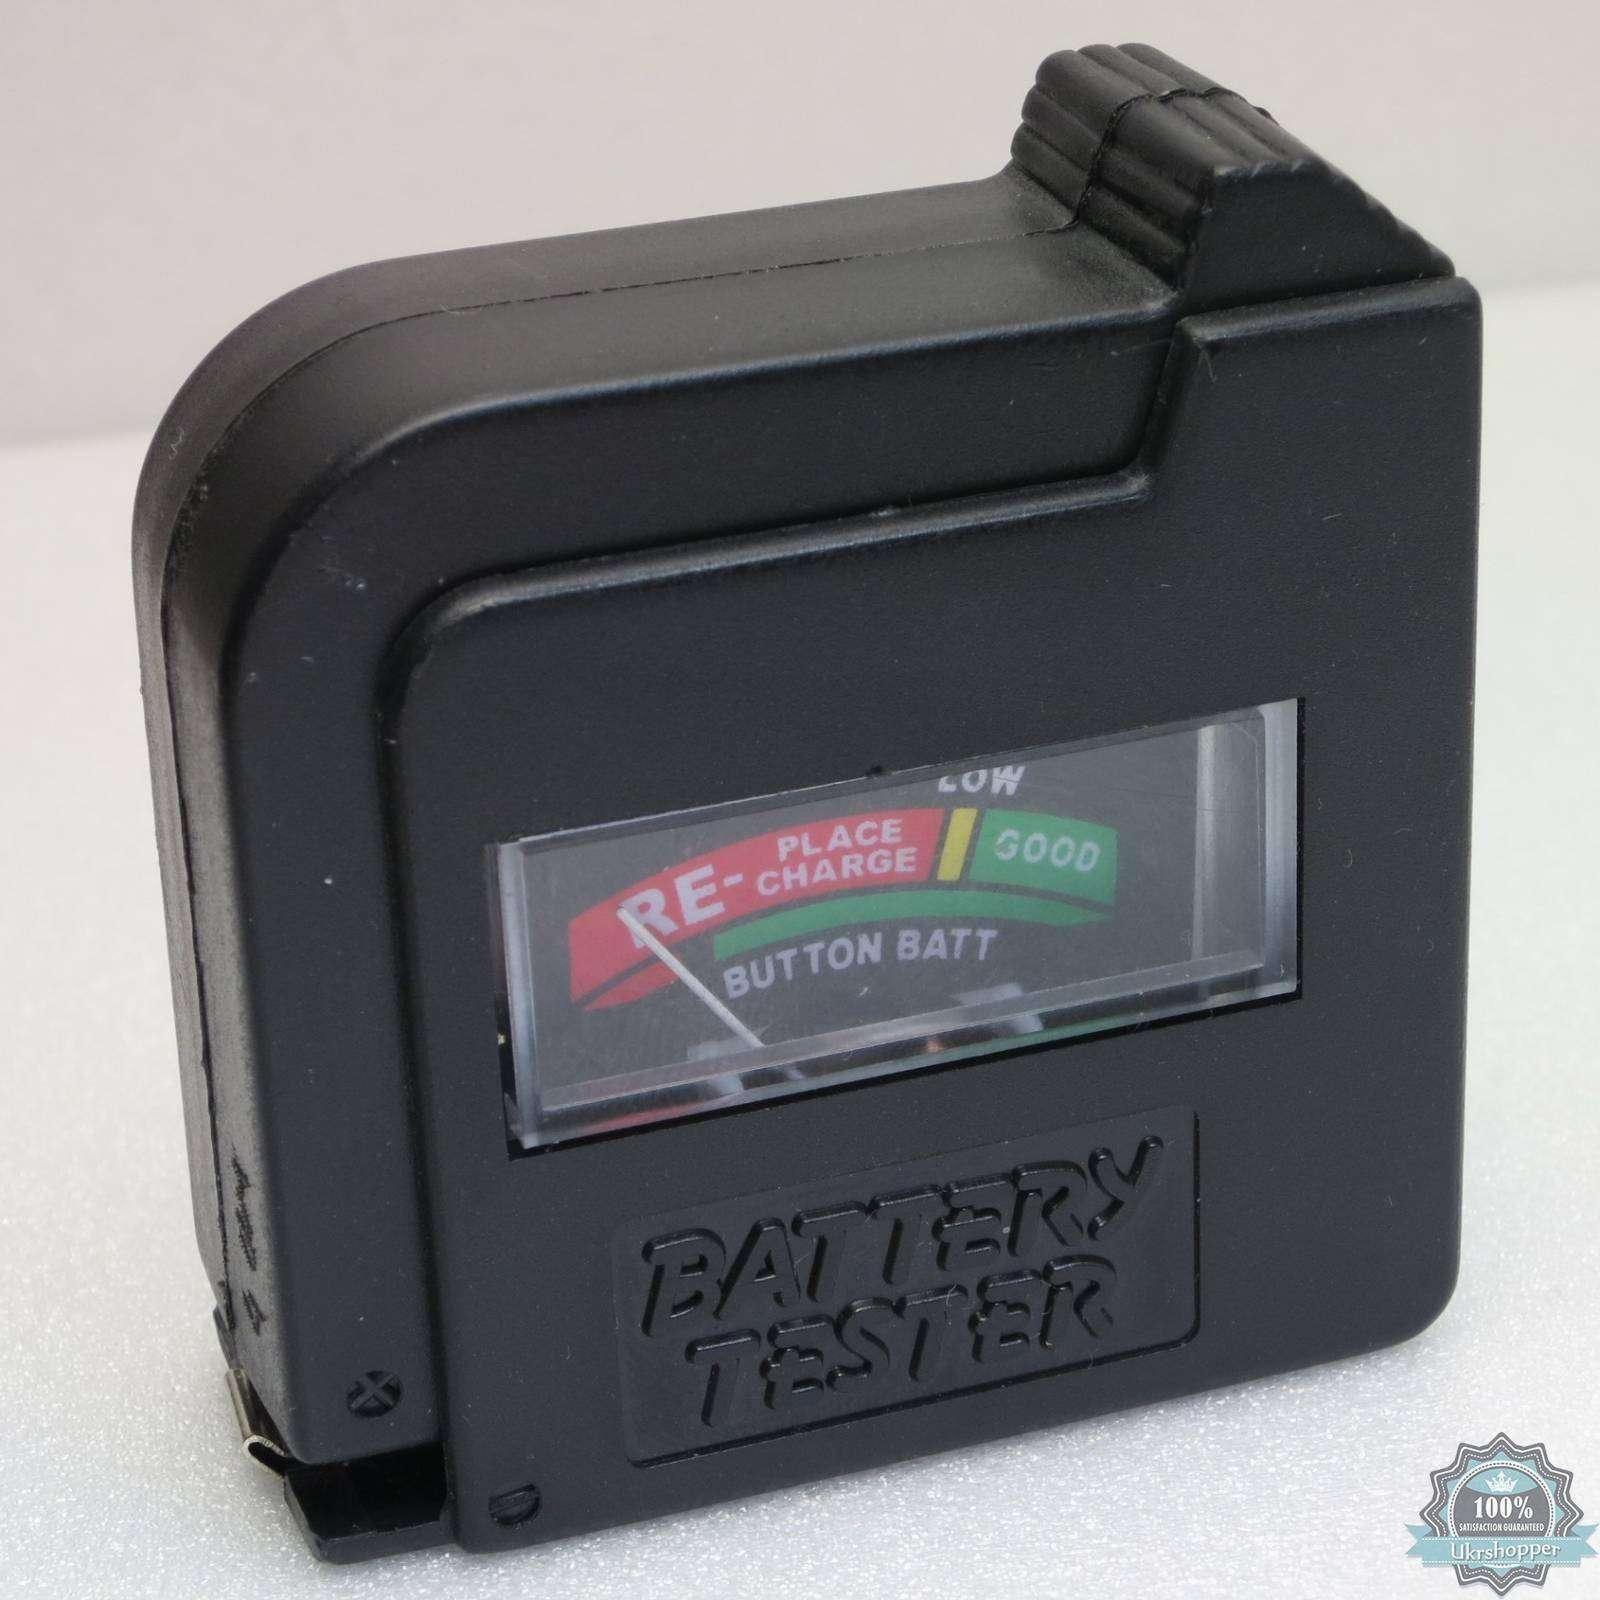 BuyinCoins: Тестер для батареек и аккумуляторов размера AA, AAA, C, D с напряжением 1.2-1.5В и 9В типа 'Крона'.